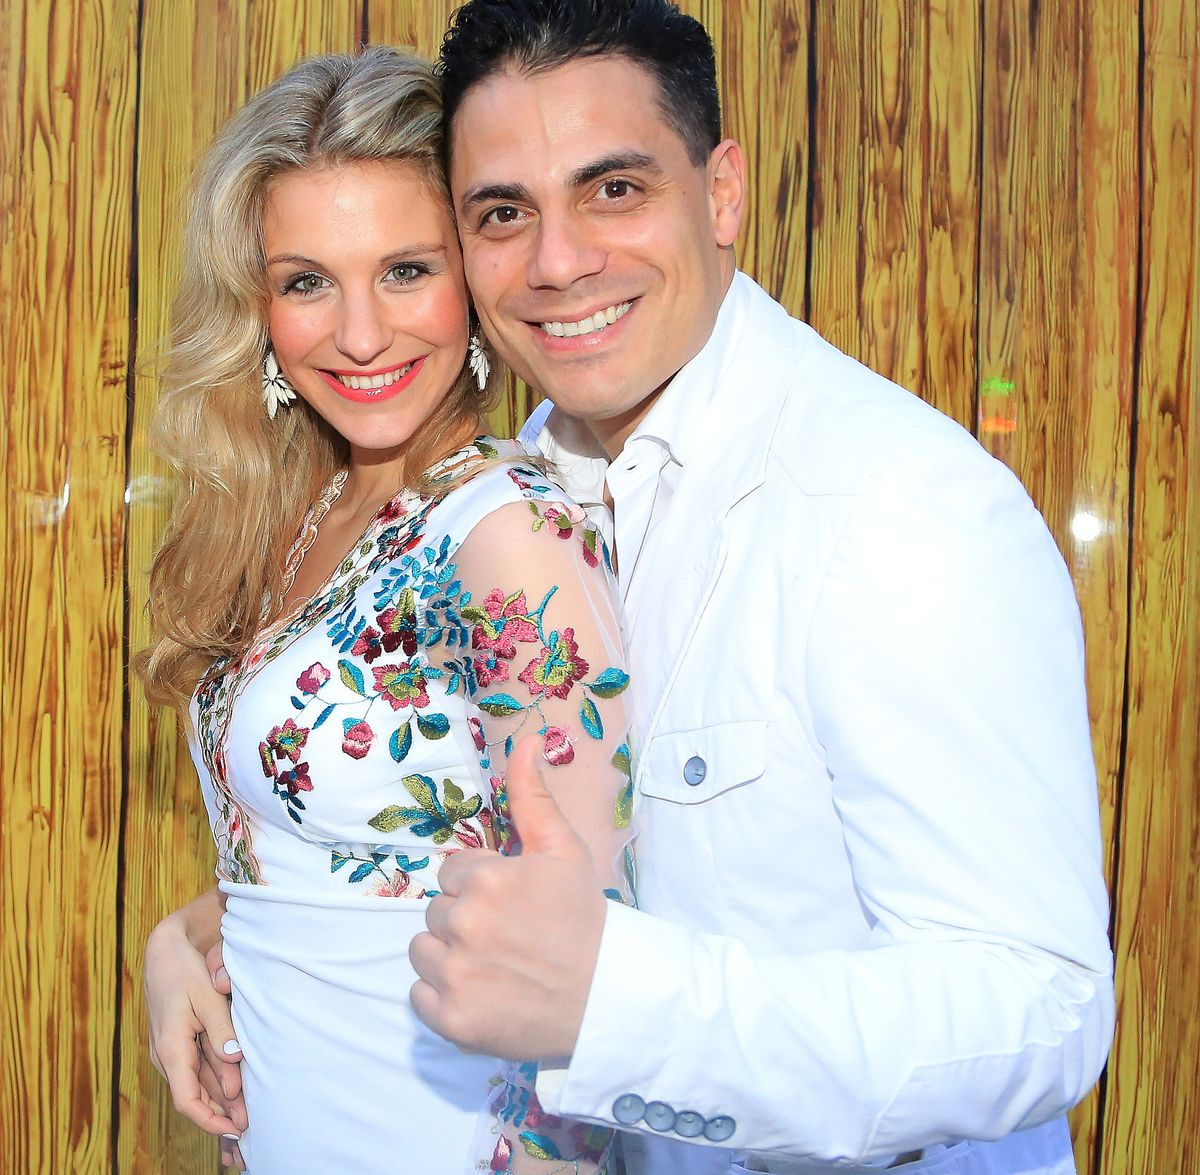 Stefanie Schanzleh, Silva Gonzalez (Hot Banditoz)